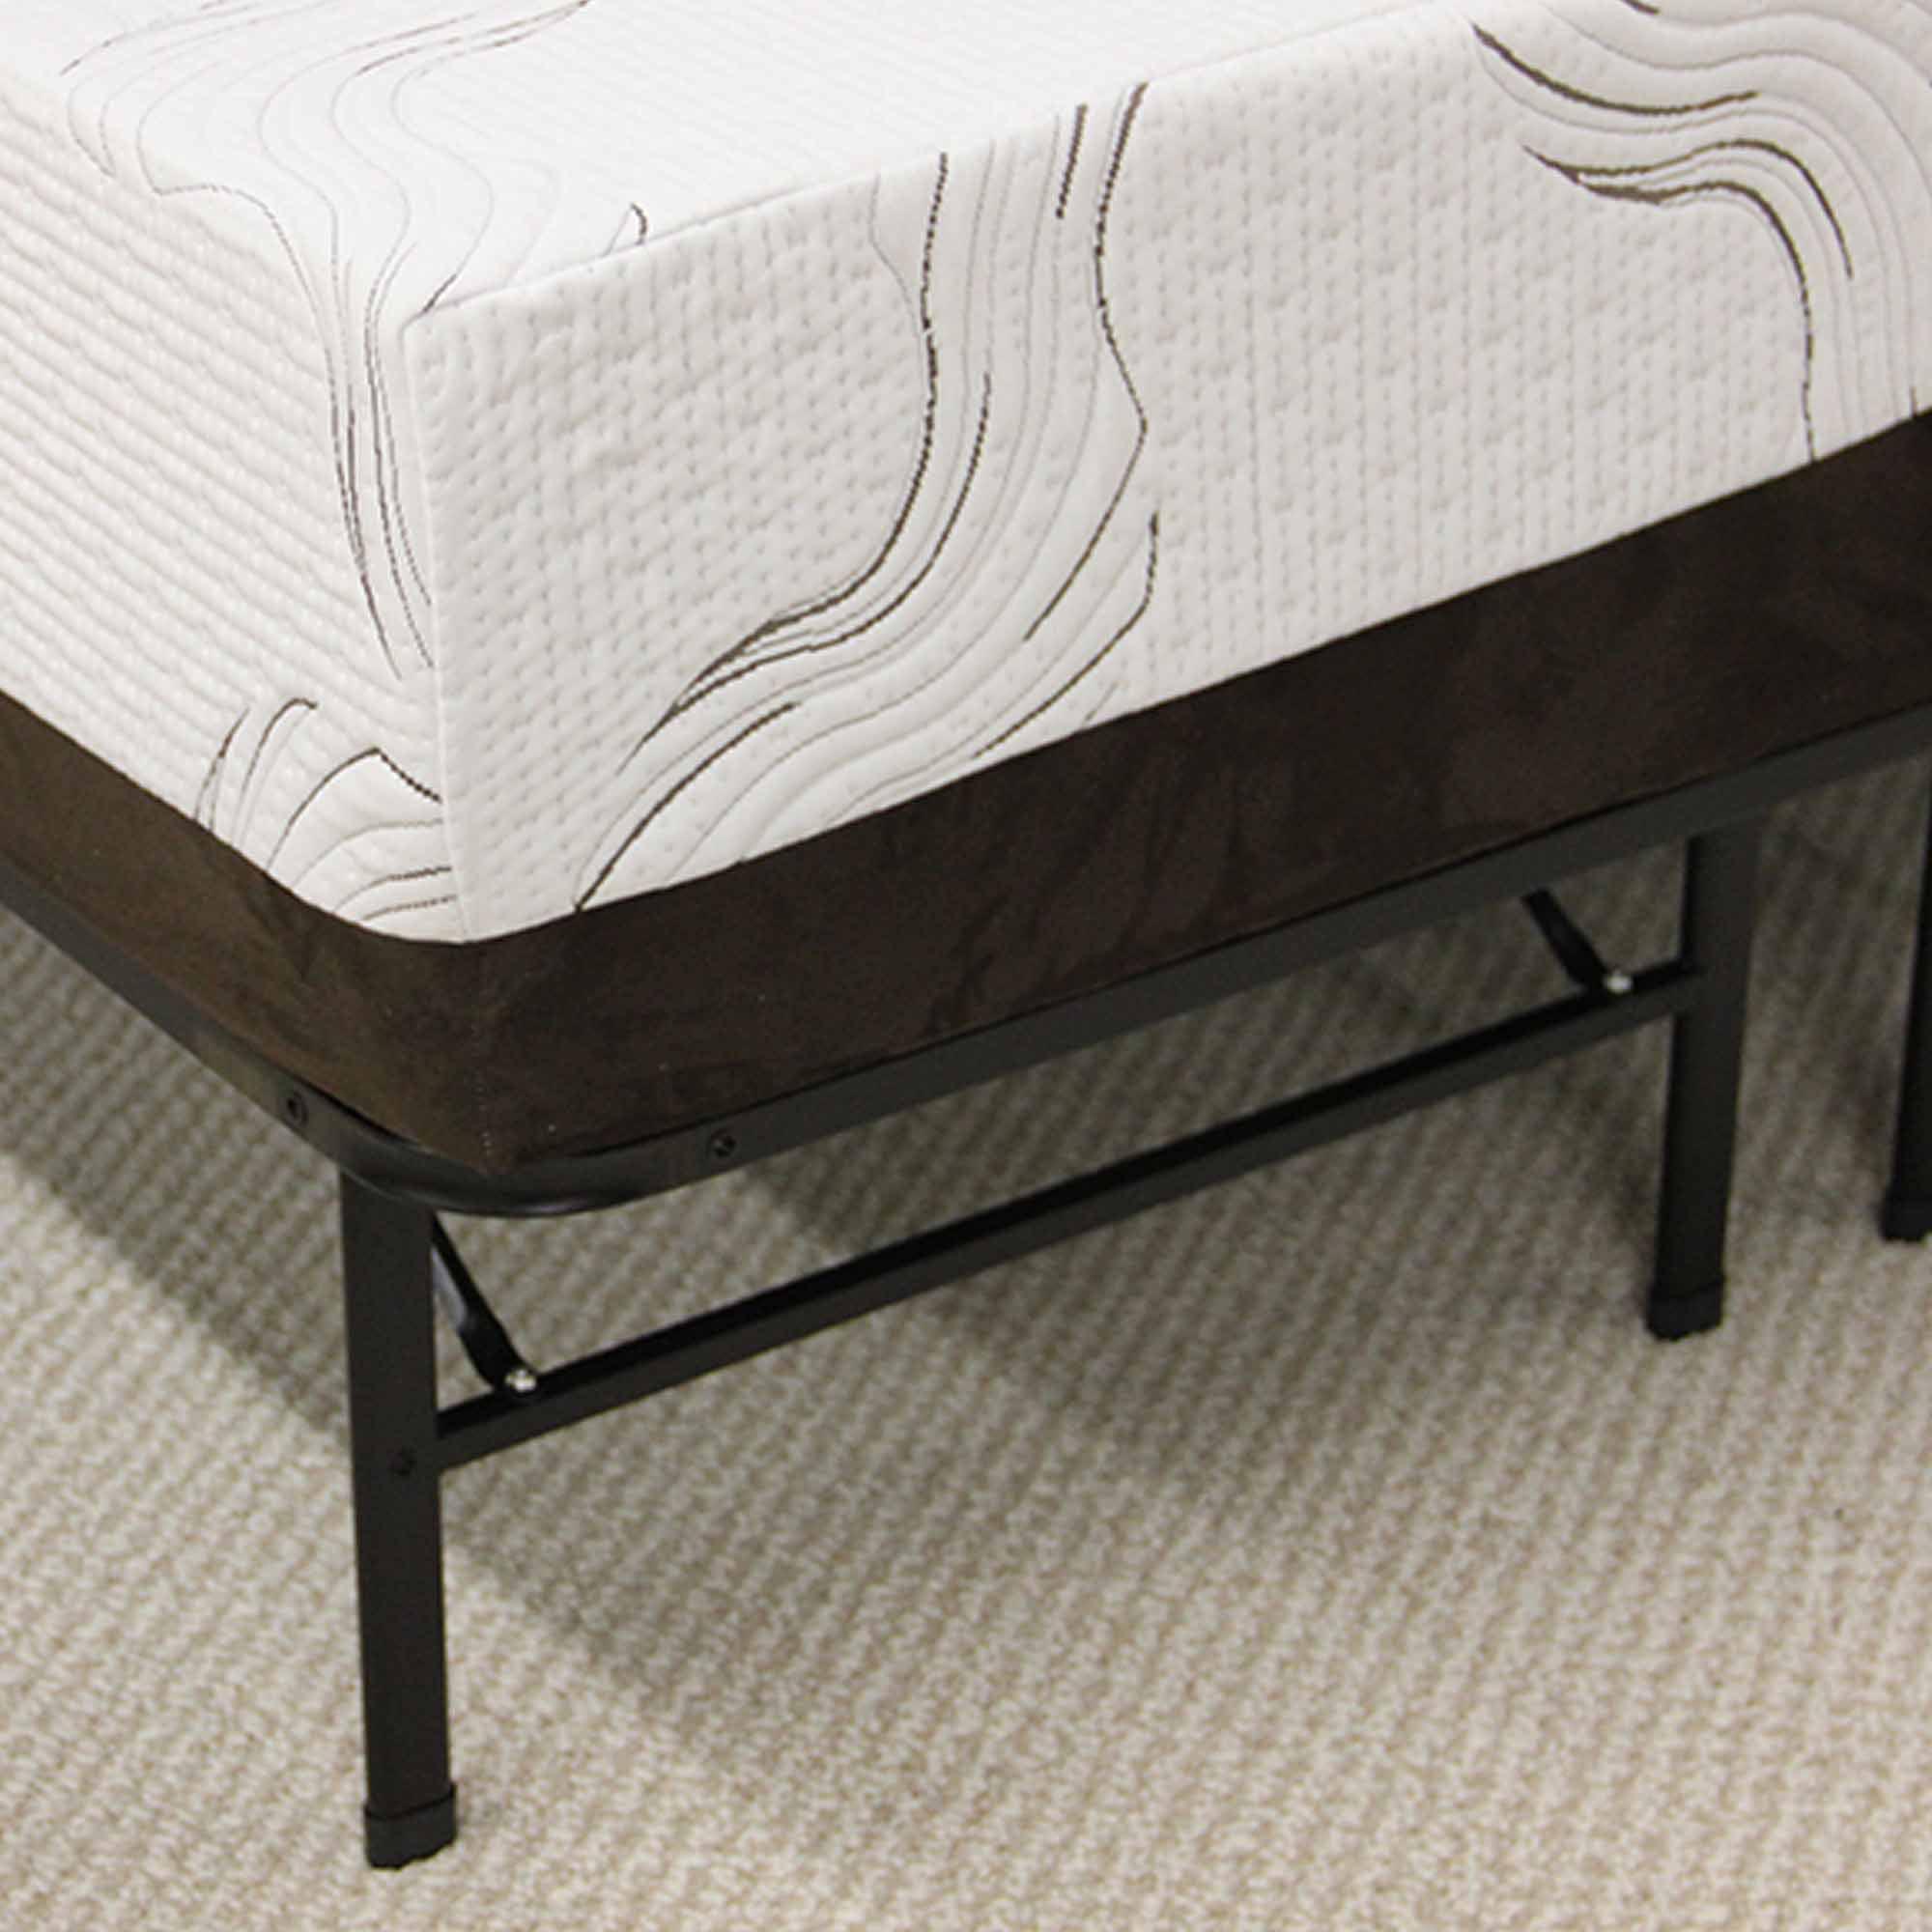 modern sleep platform metal bed frame mattress foundation walmartcom